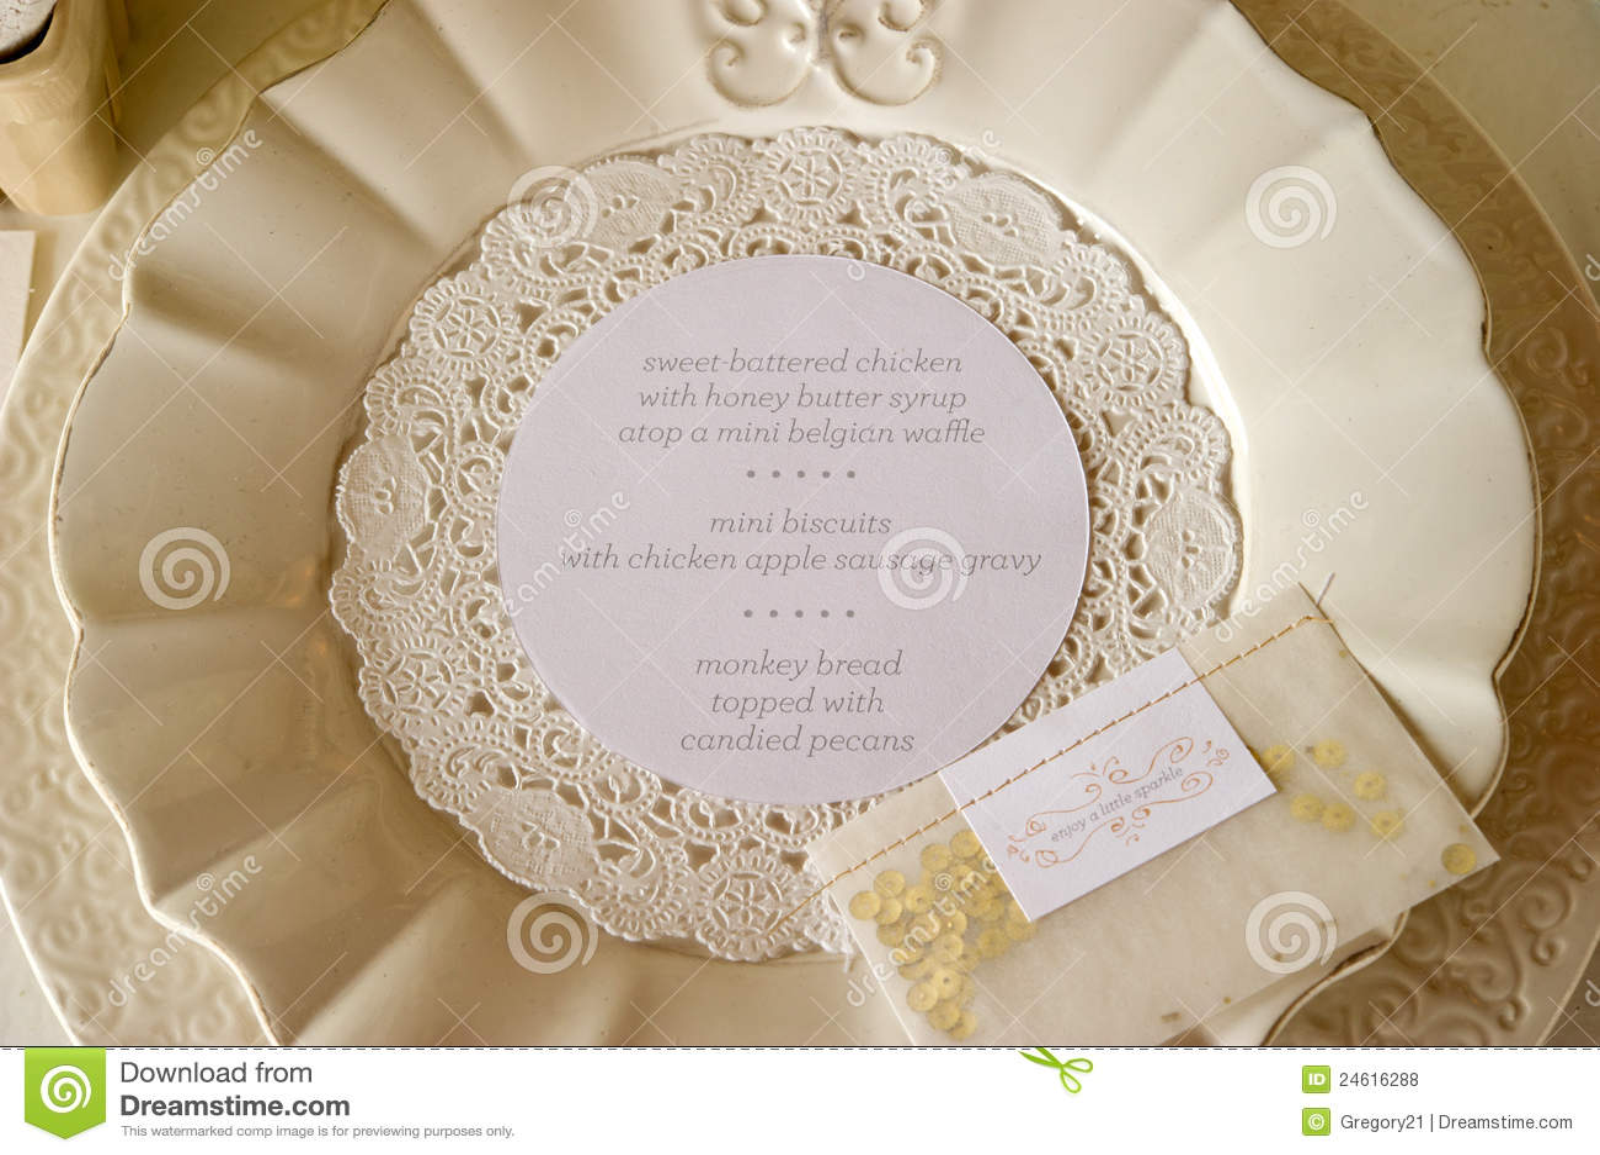 Wedding Dinner Menu Place Setting Royalty Free Stock Photos